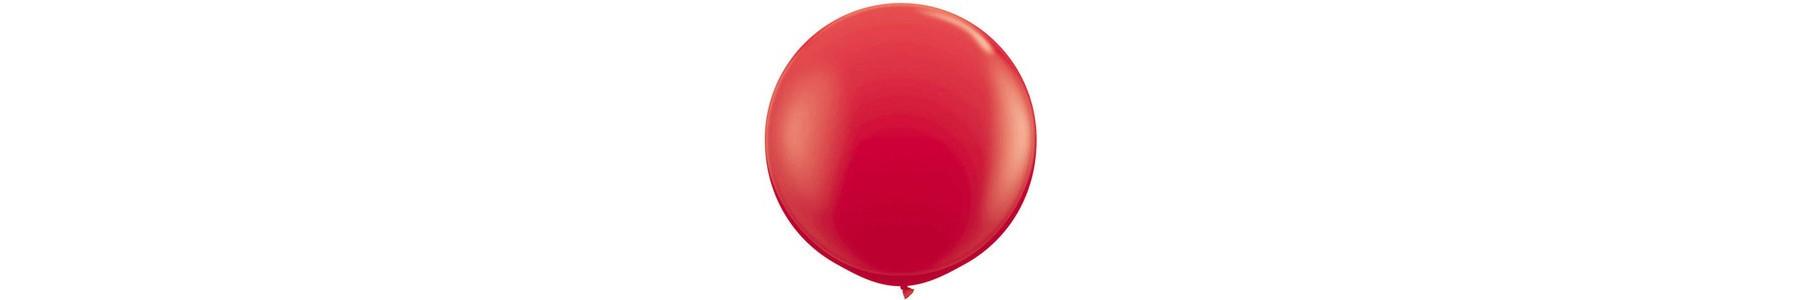 Baloane latex jumbo 110 cm